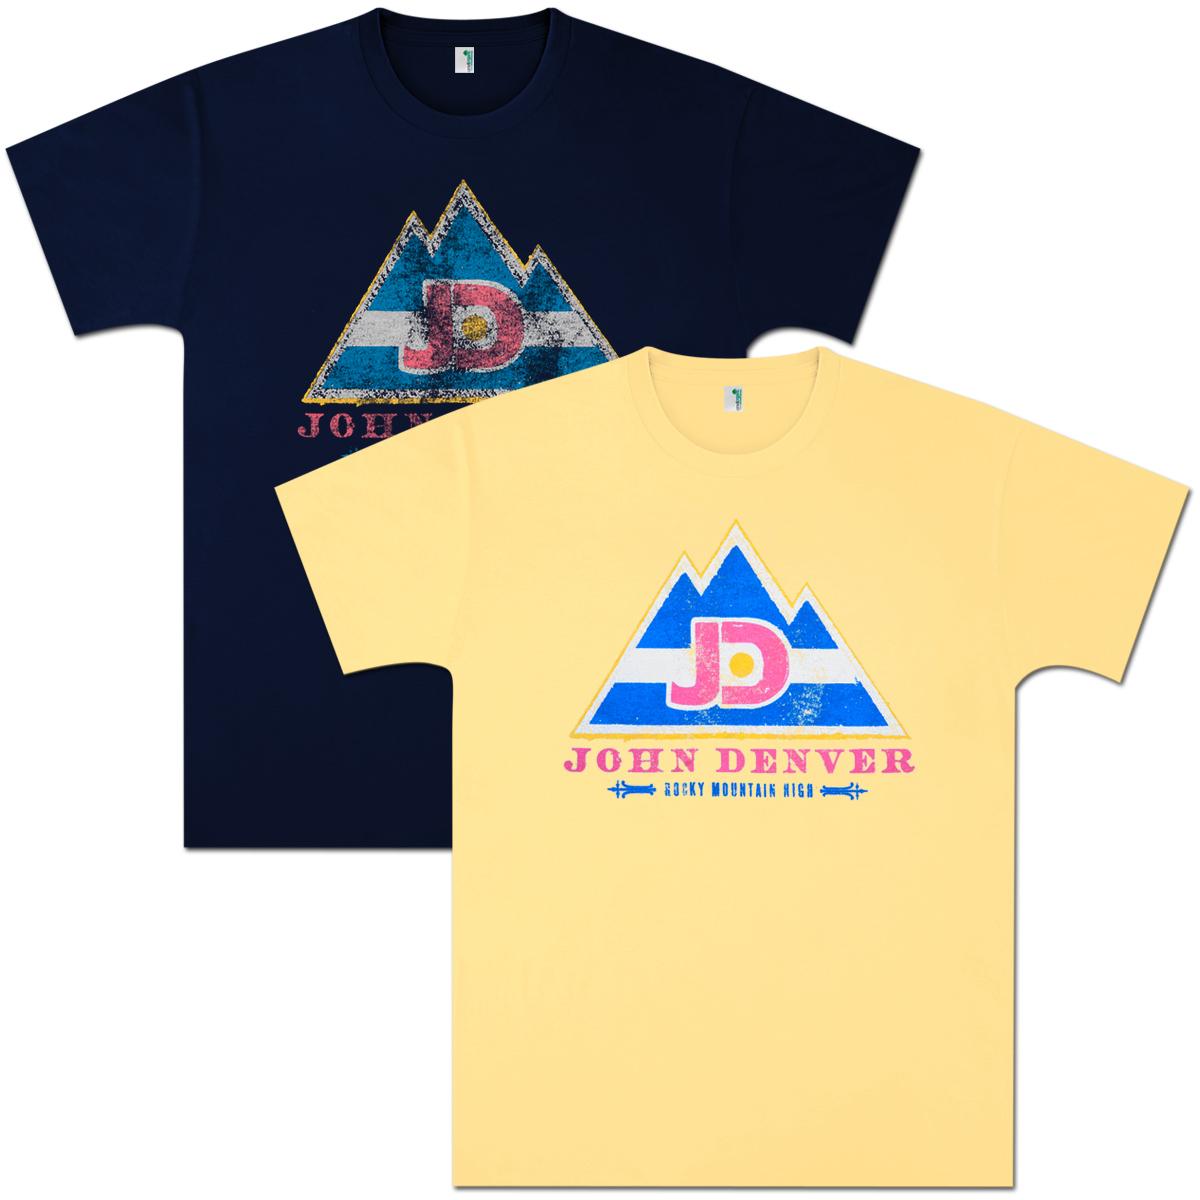 John Denver - Rocky Mountain High Men's T-shirt